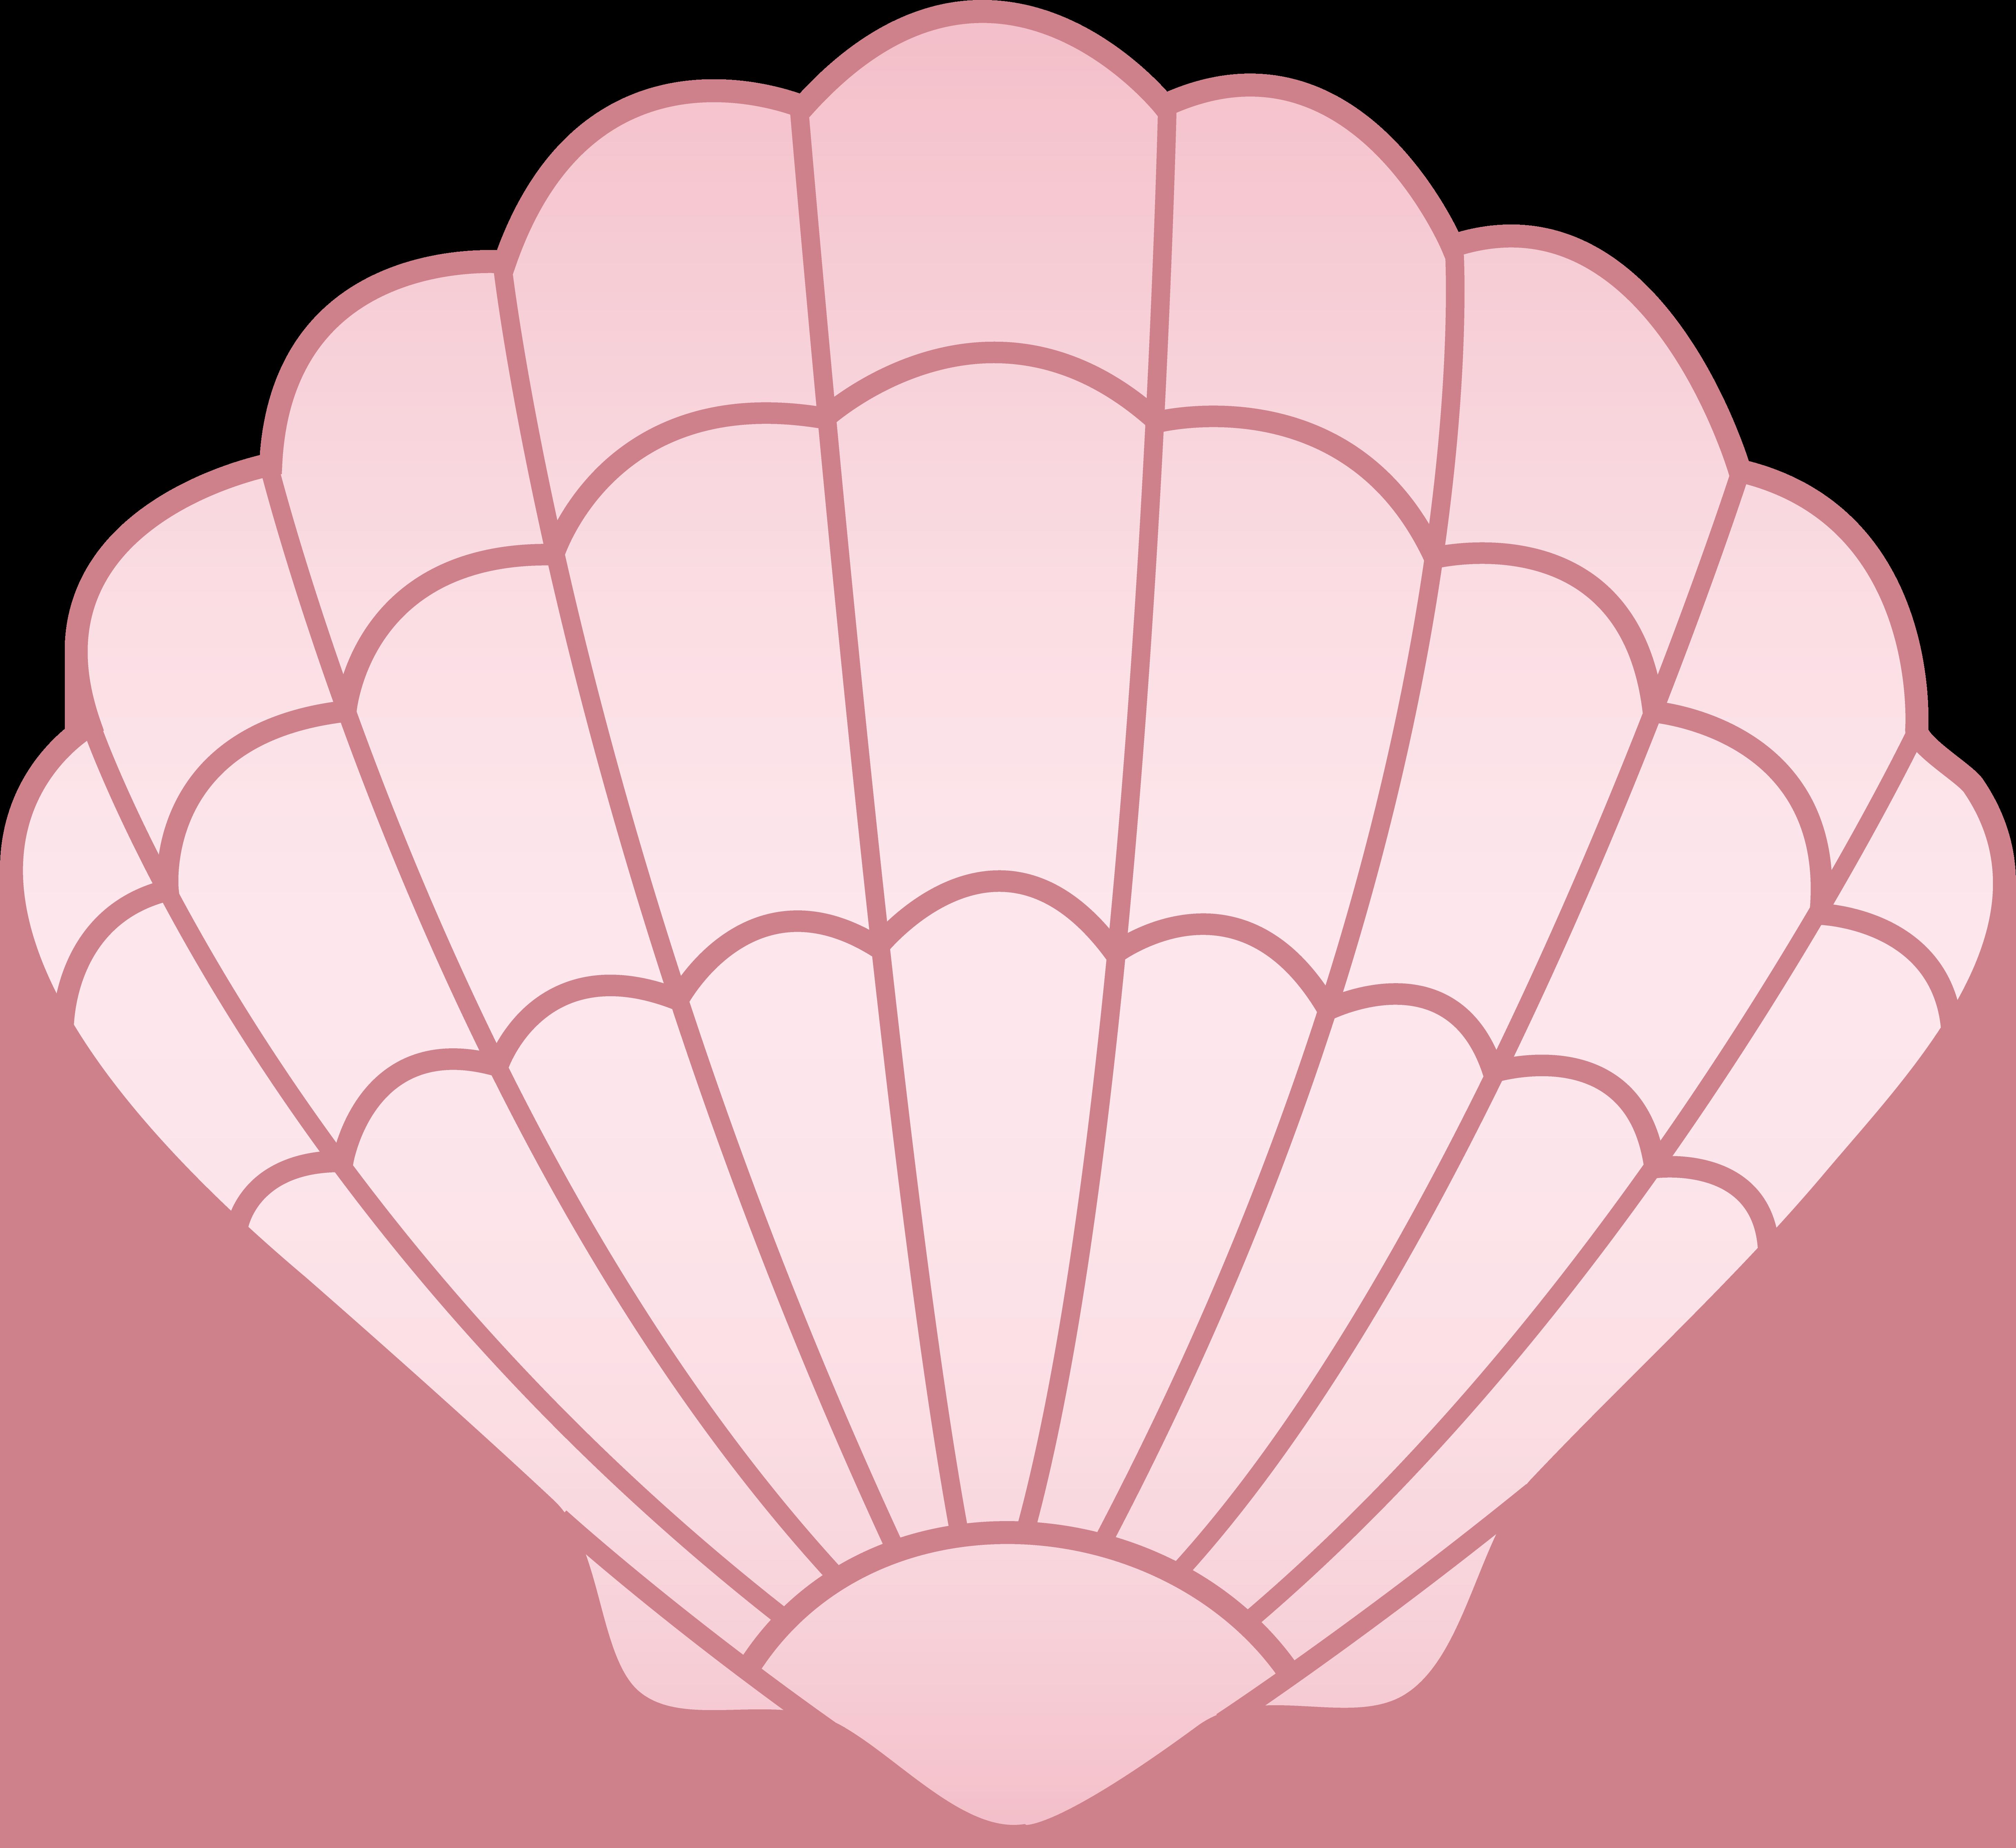 Pink seashell cliparts vector library stock Pink Seashell - Free Clip Art vector library stock